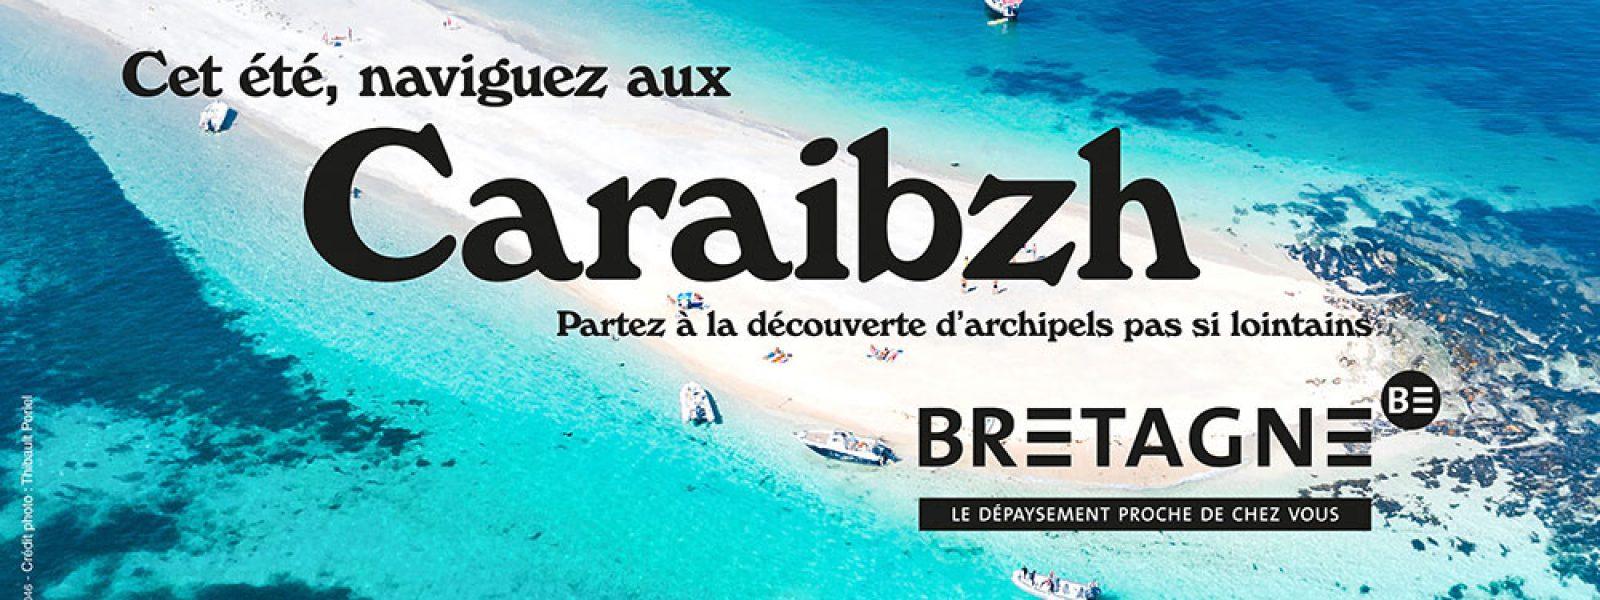 Caraibzh-Bretagne